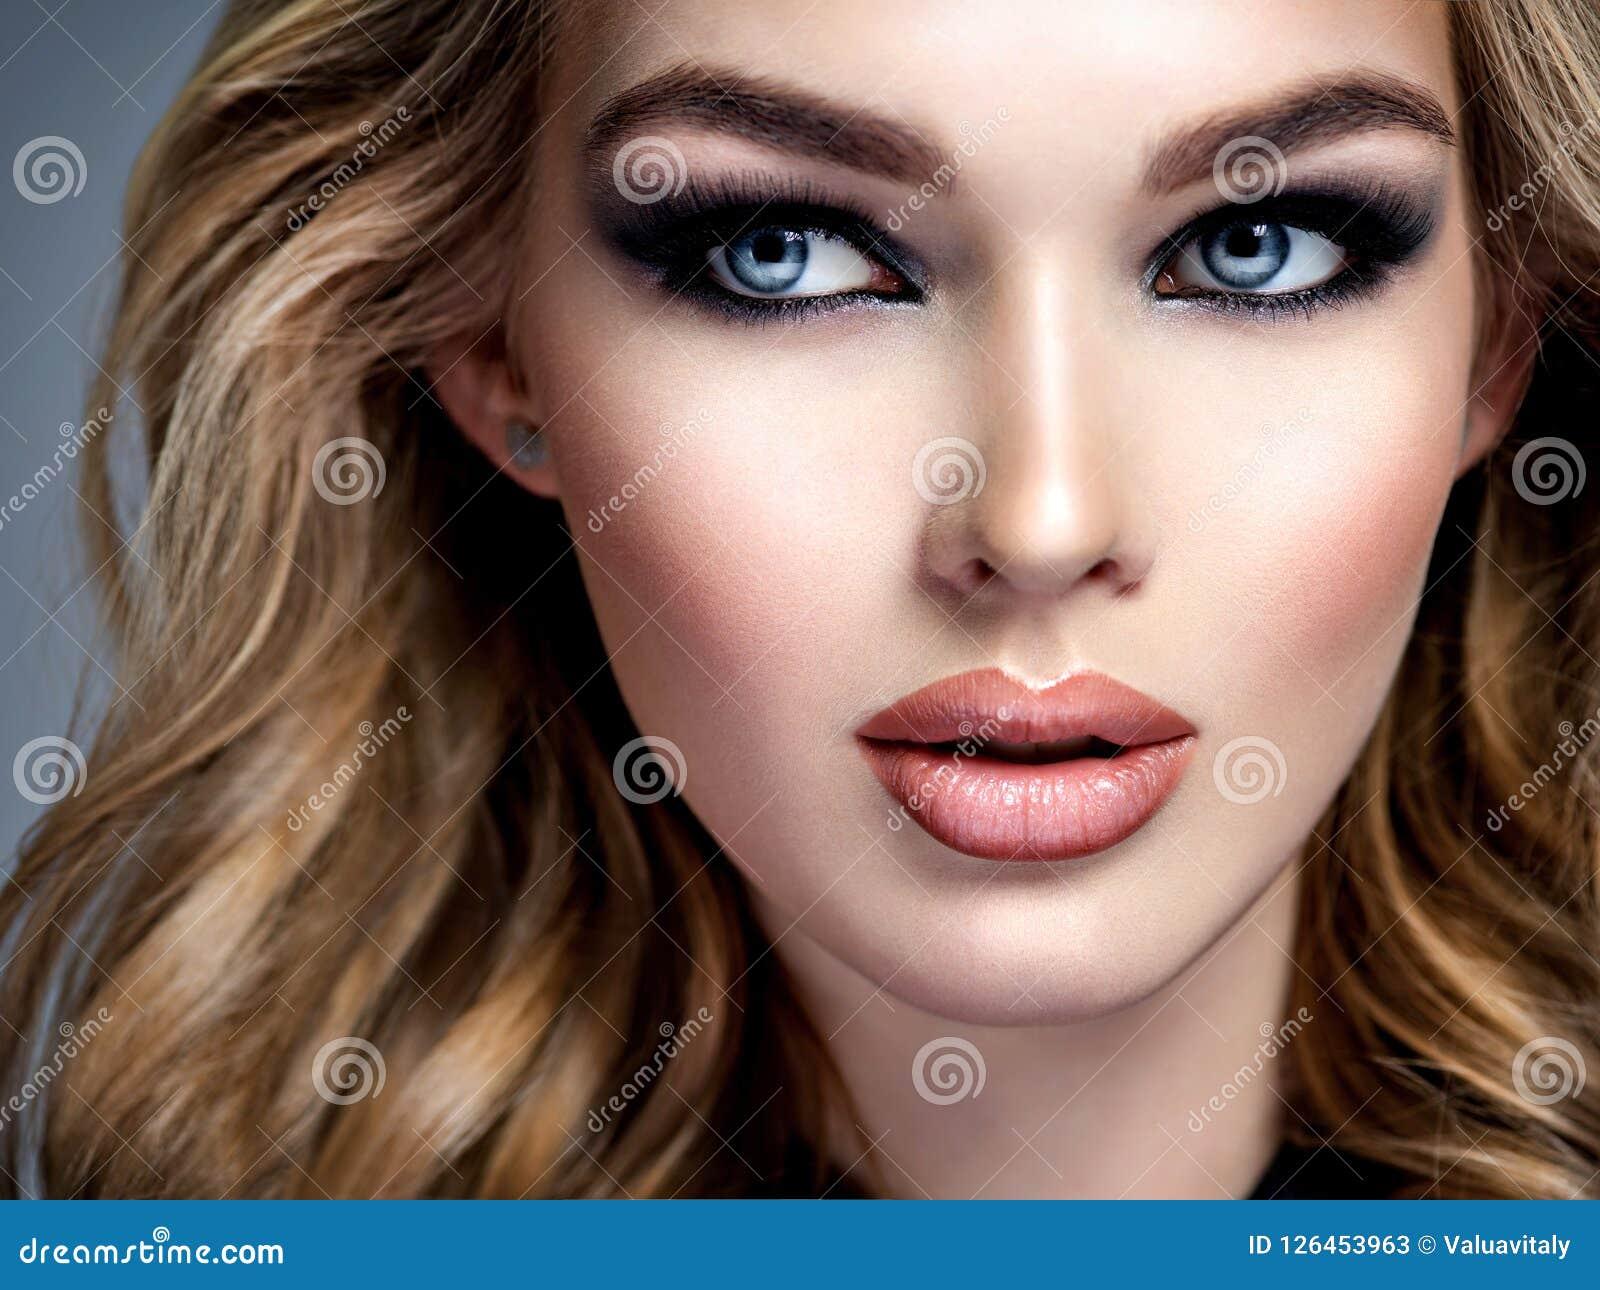 beautiful girl with makeup in style smoky eye